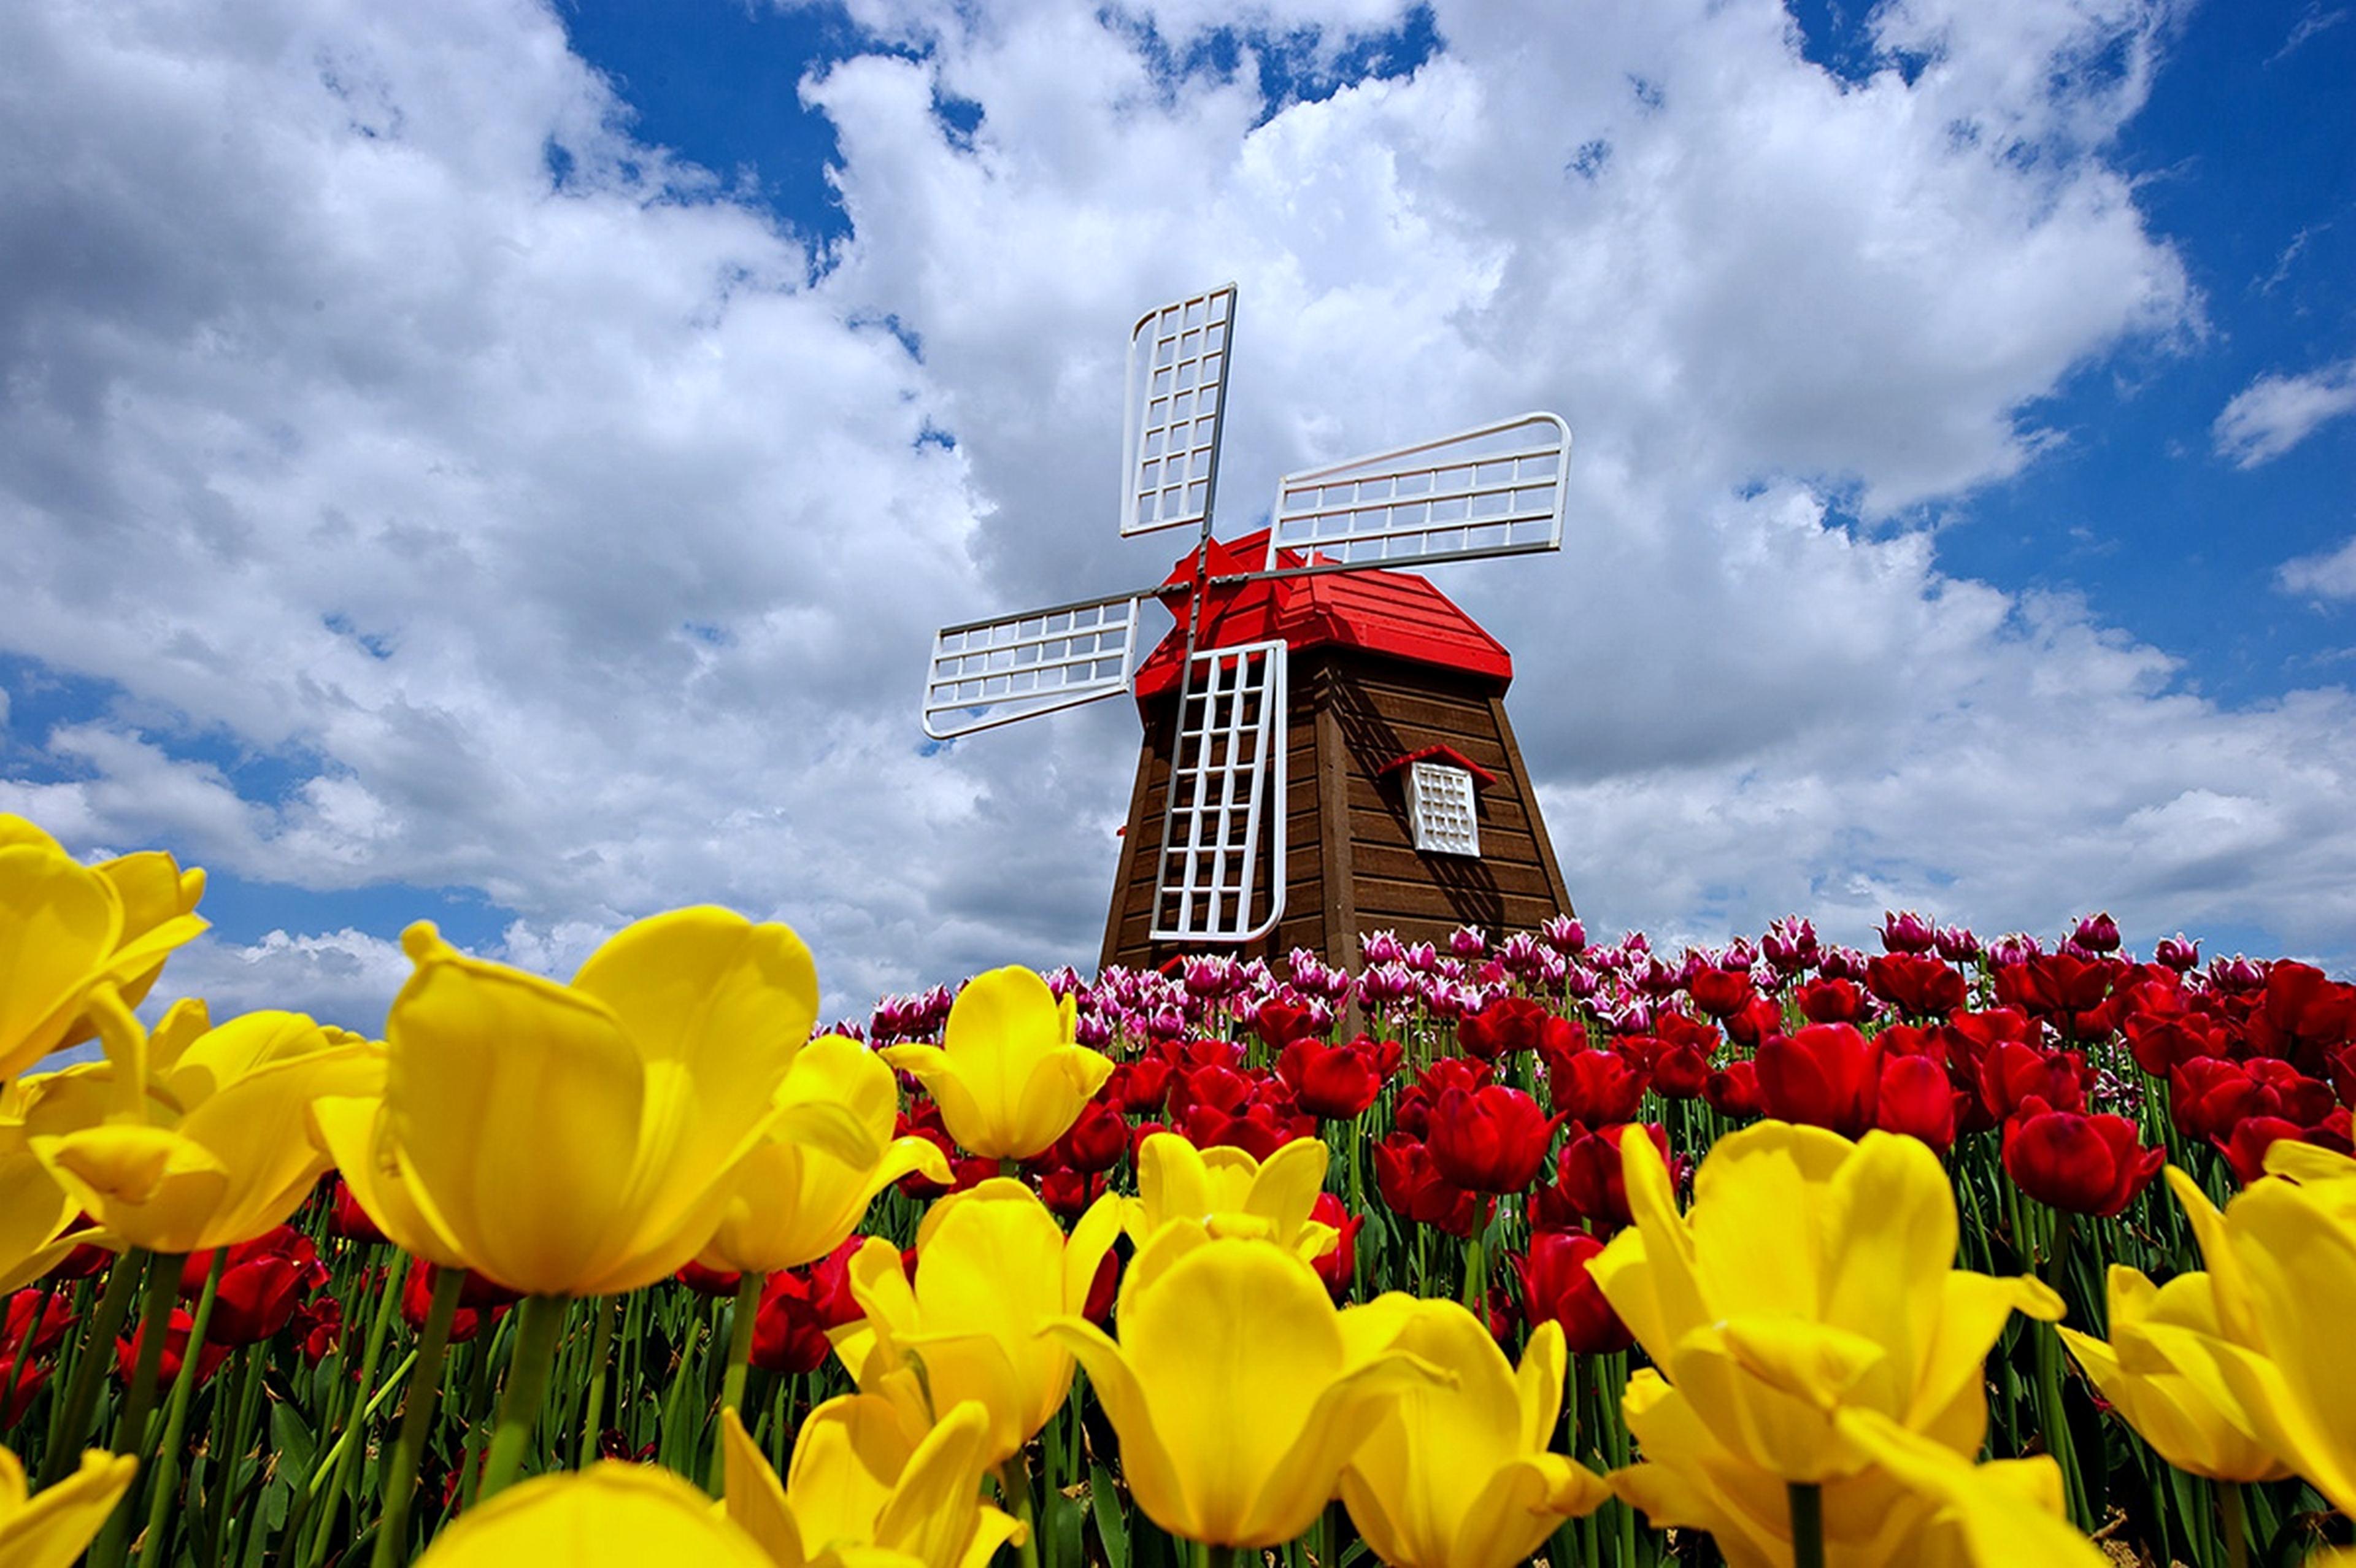 Spring 4k ultra hd fond d 39 cran and arri re plan for Fond ecran casa de papel